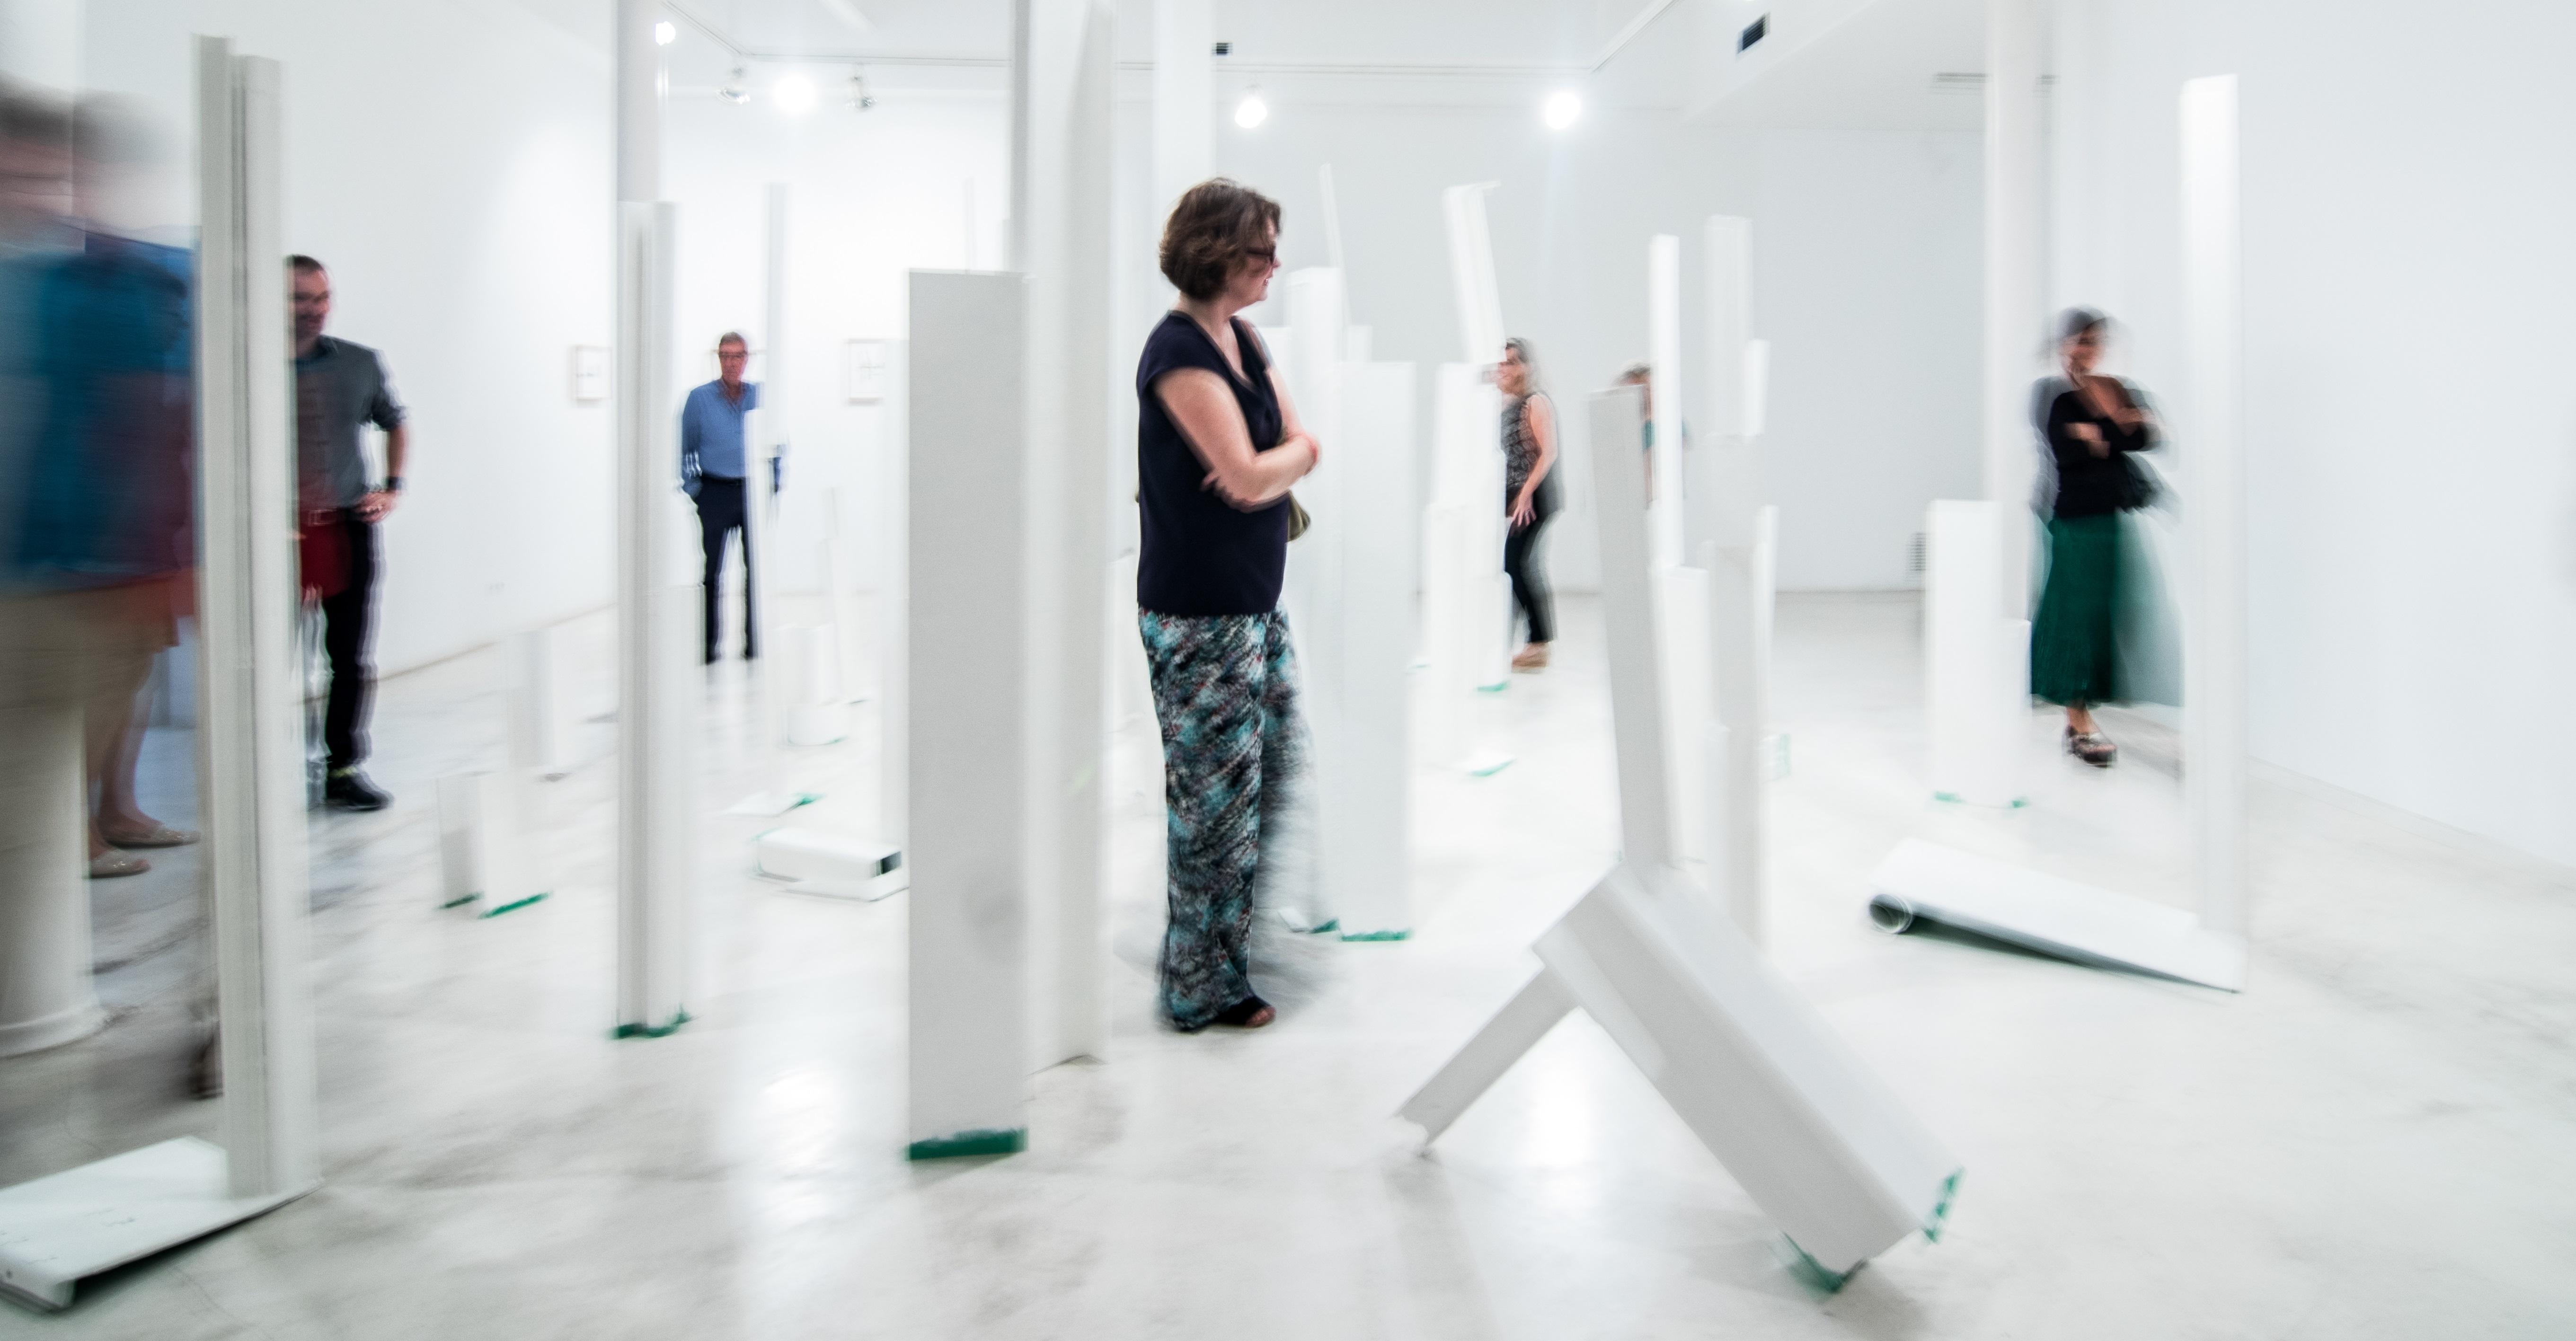 Galeria Joan Prats. Barcelona Gallery Weekend 2018. Foto: Dani Canto.